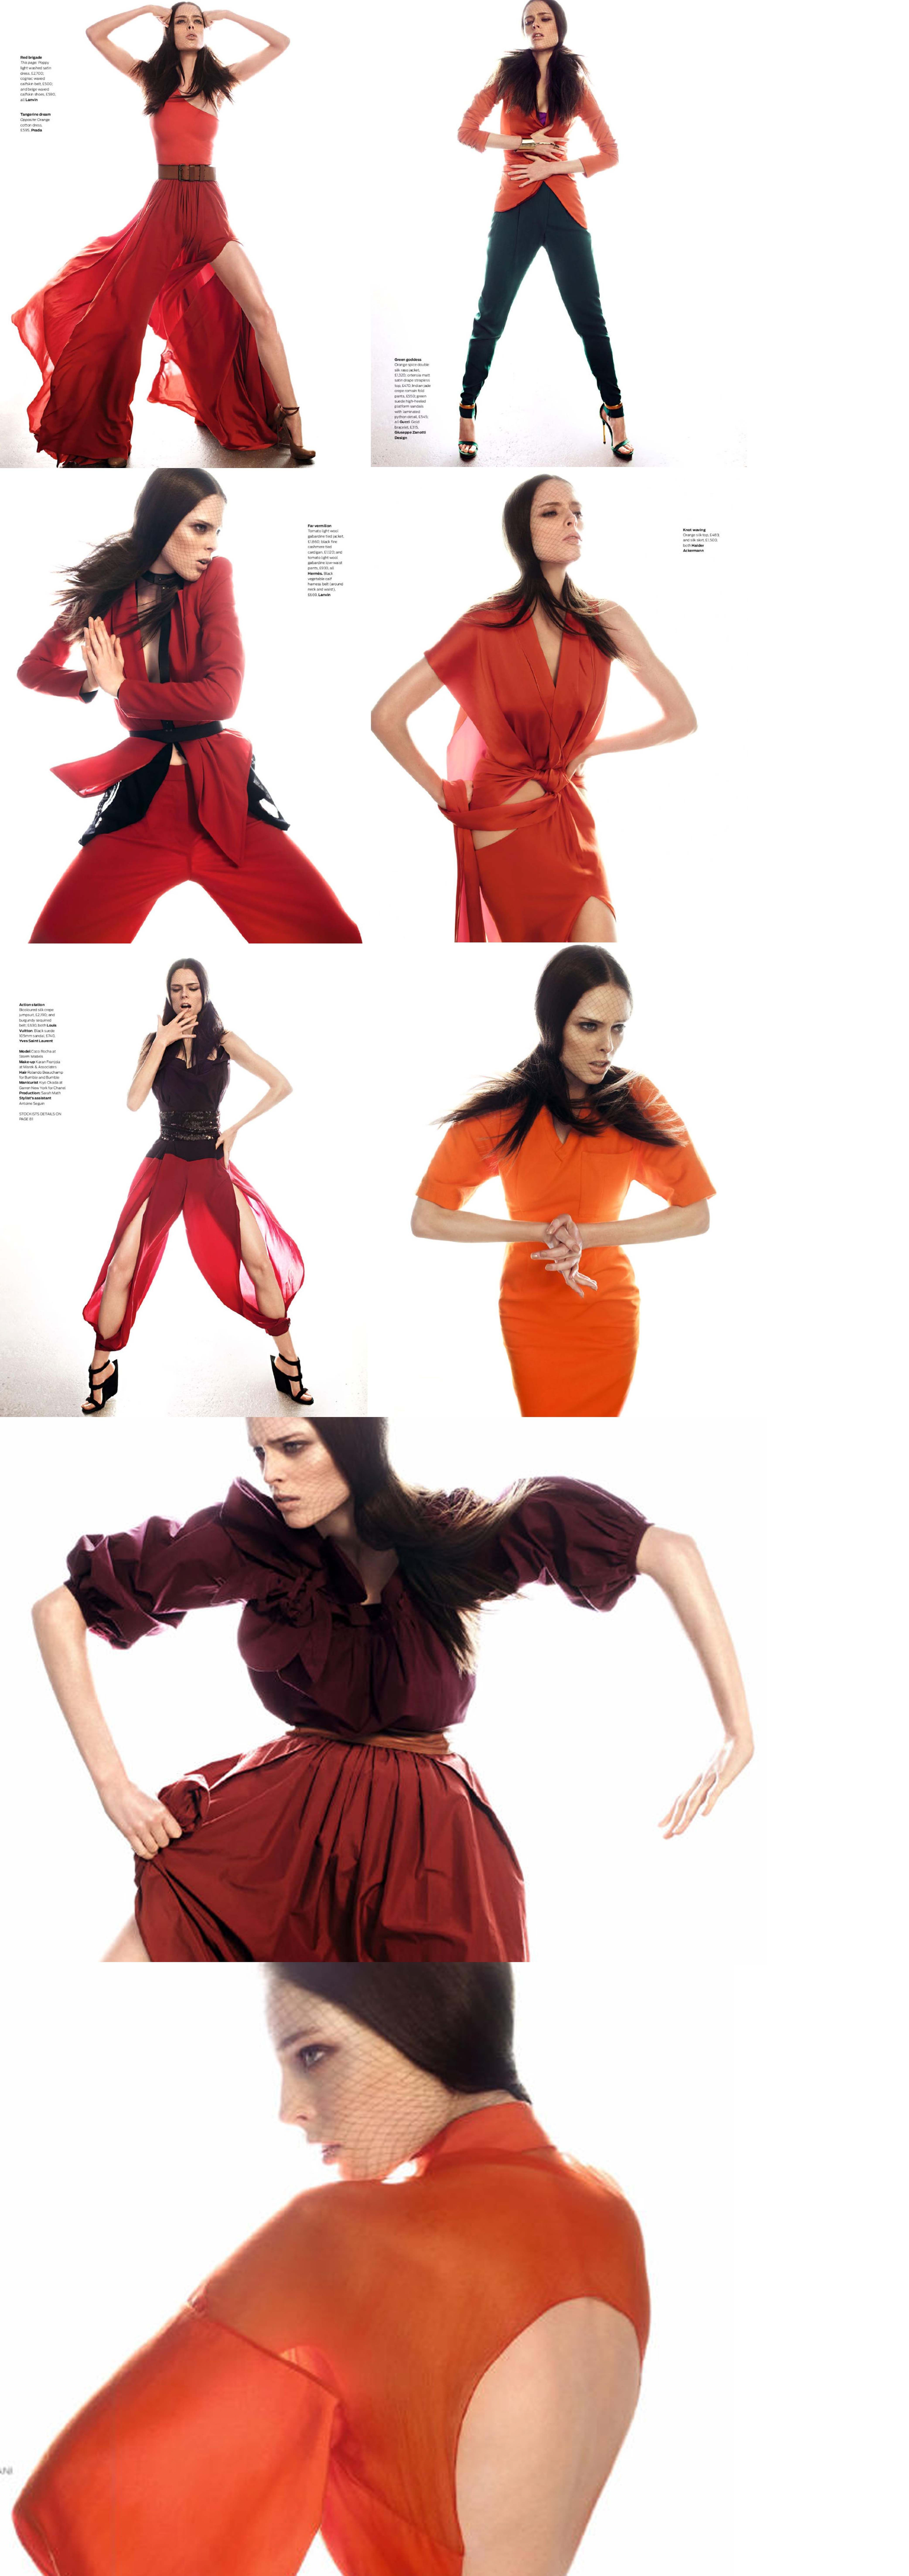 Coco Rocha The Posing Queen High Fashion Poses Fashion Model Poses Fashion Photography Poses